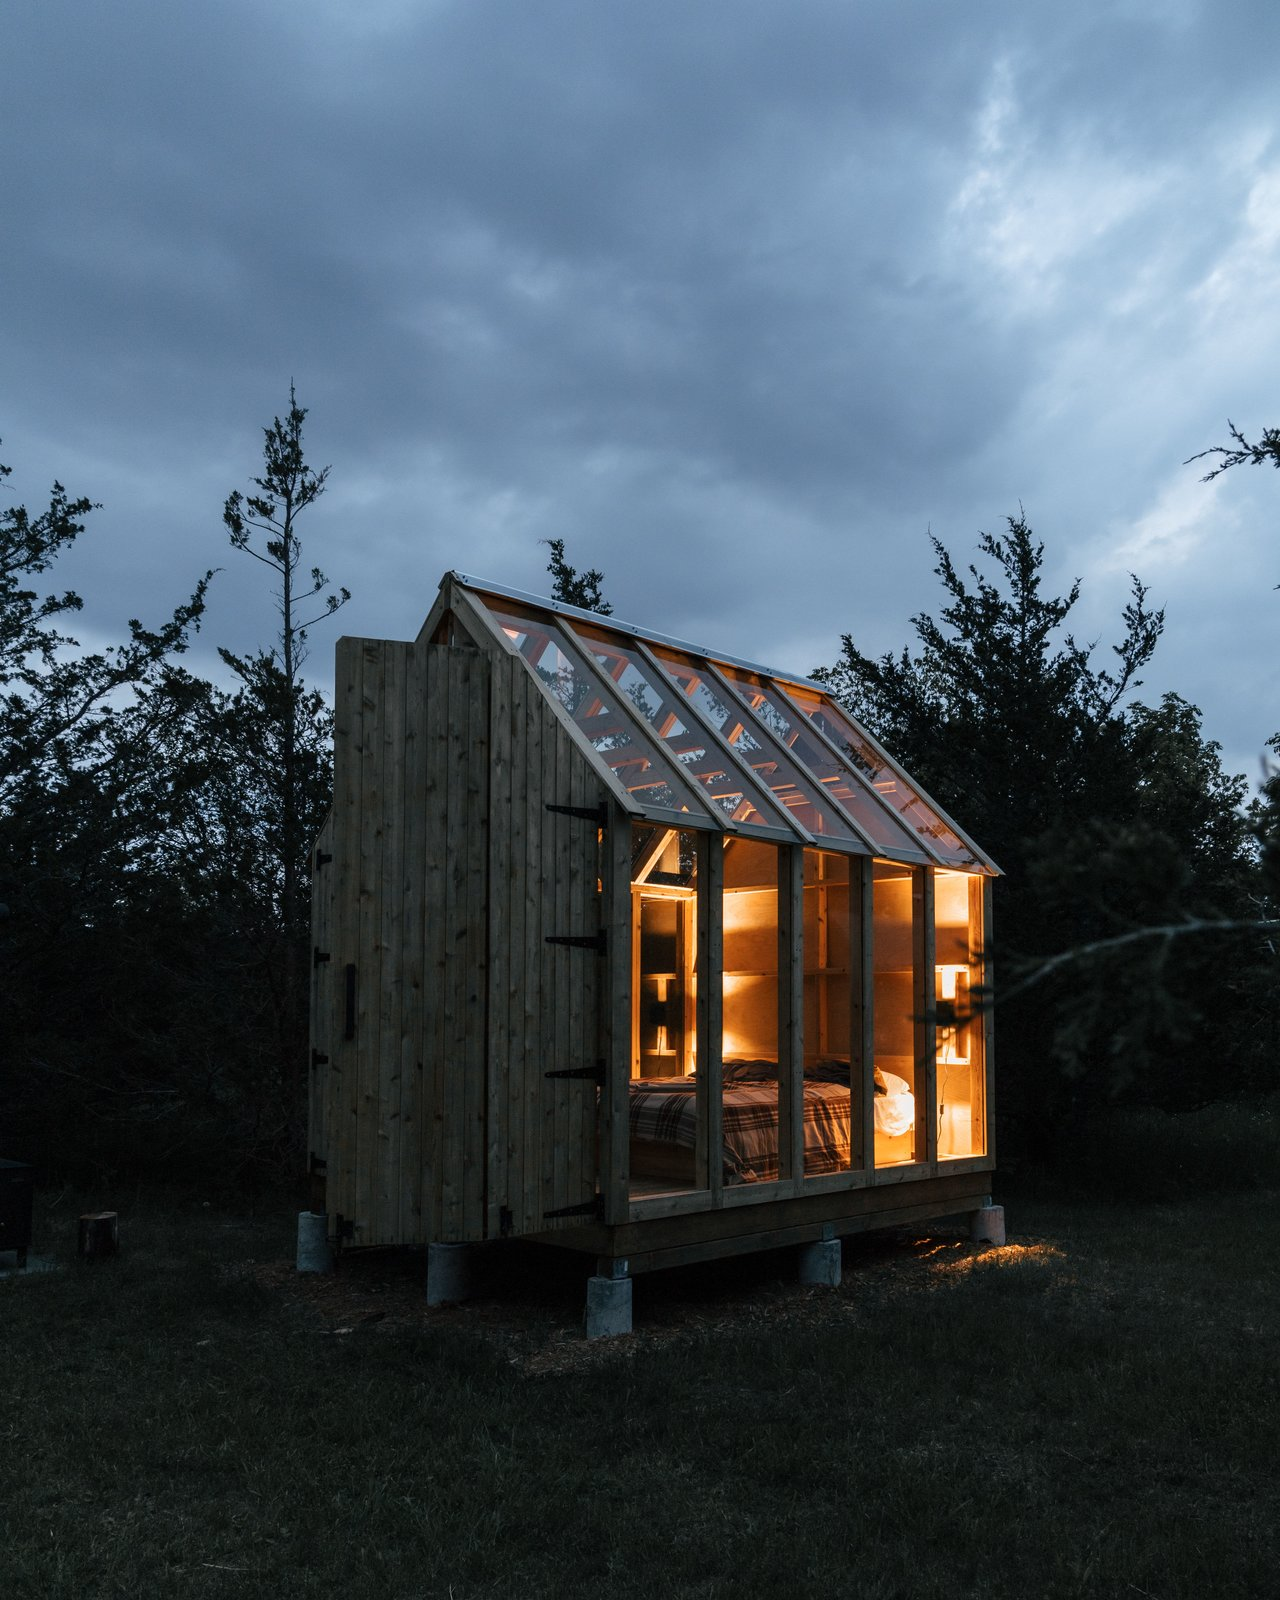 Skyward Cabin exterior at night